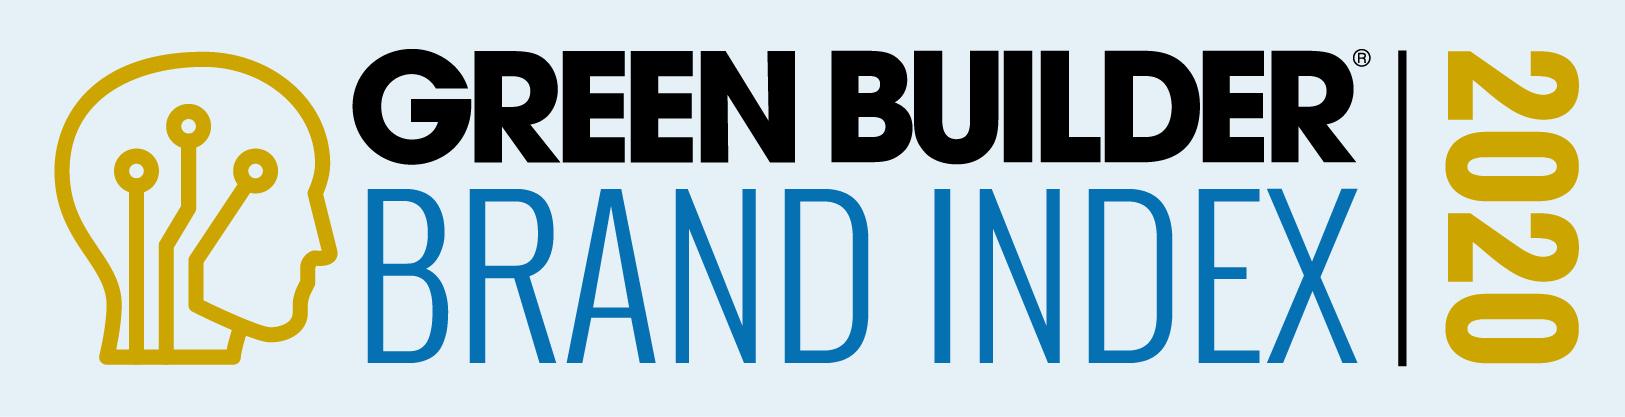 GB-2020-Brand Index-logo